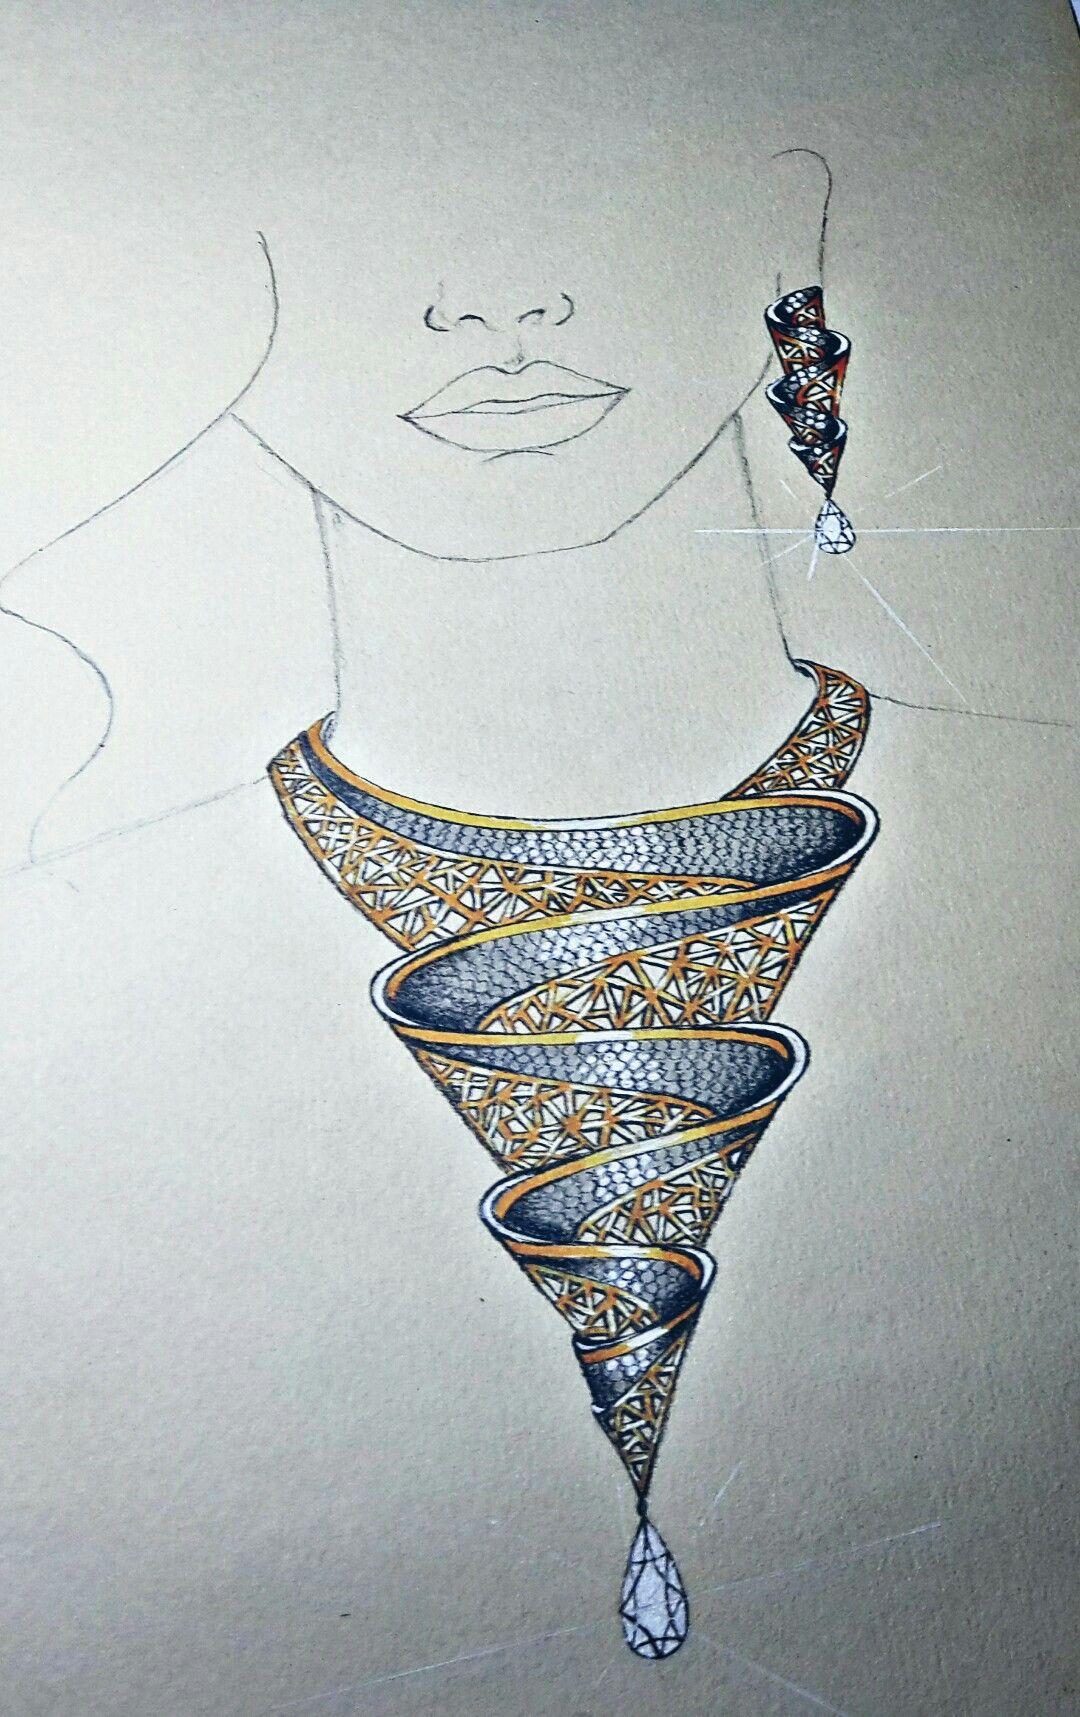 Pin by Glsn Glen on my Jewellery designs Pinterest Jewellery